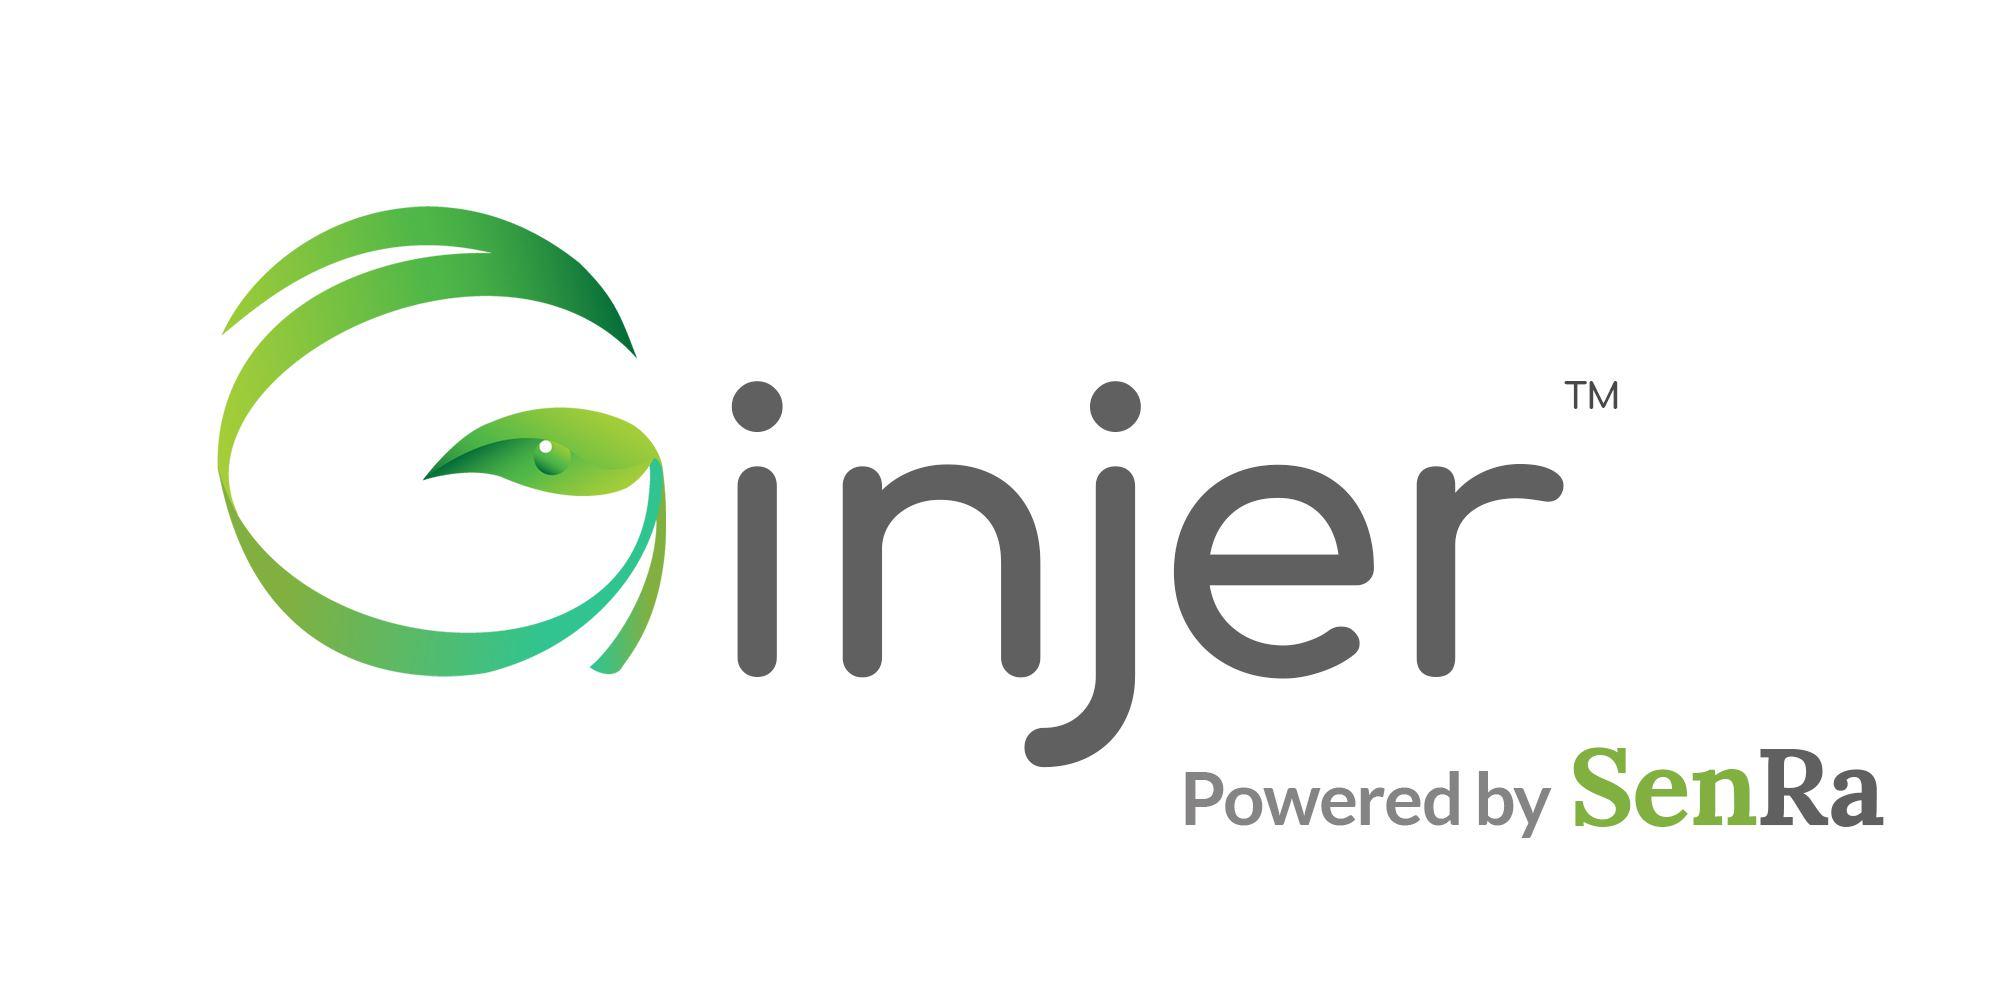 SenRa releases Ginjer 2.0 IoT analytics platform